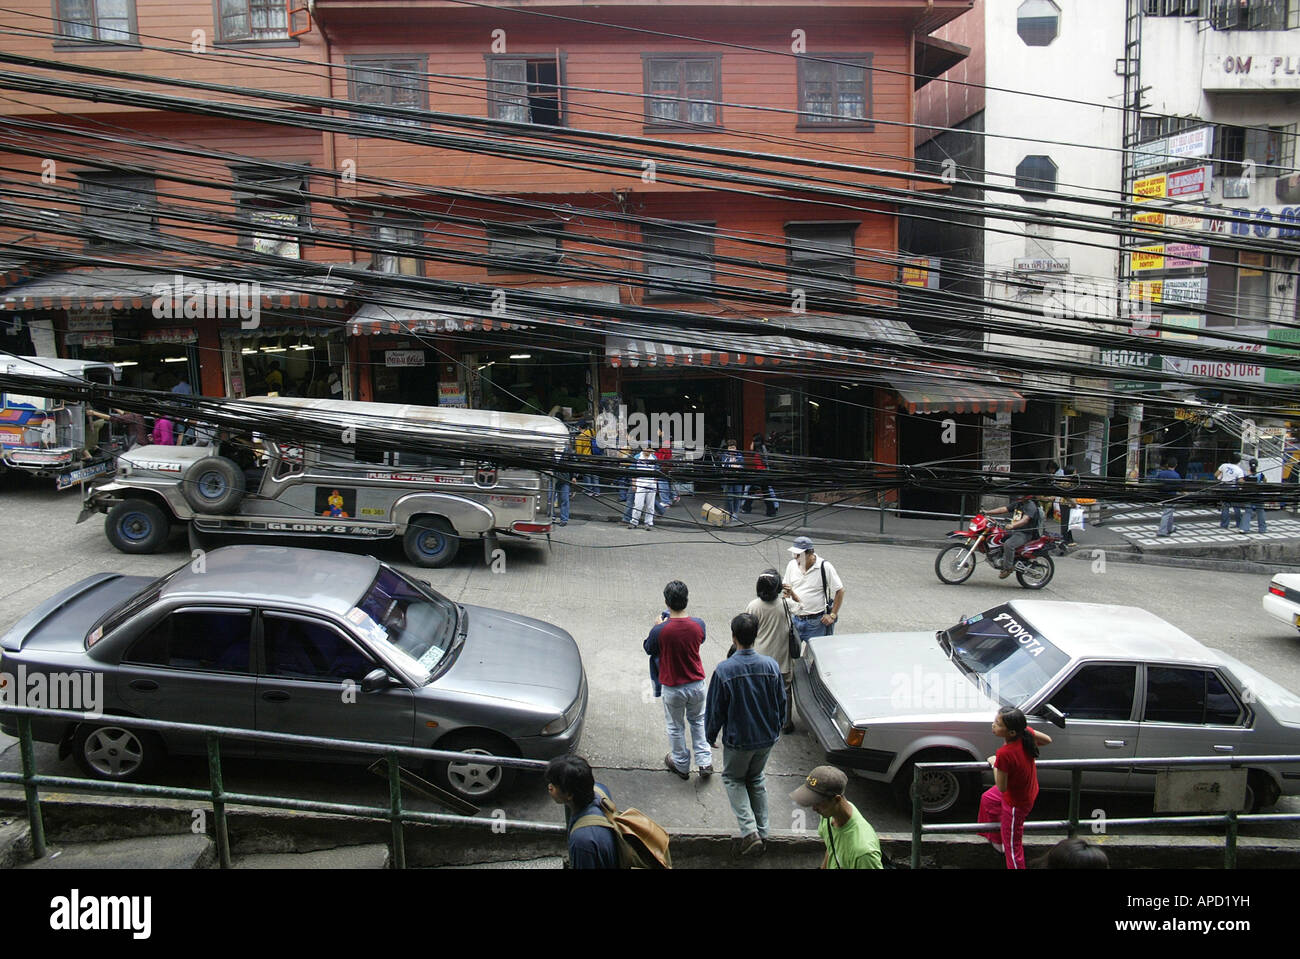 A street scene in Baguio City, Philippines. Stock Photo